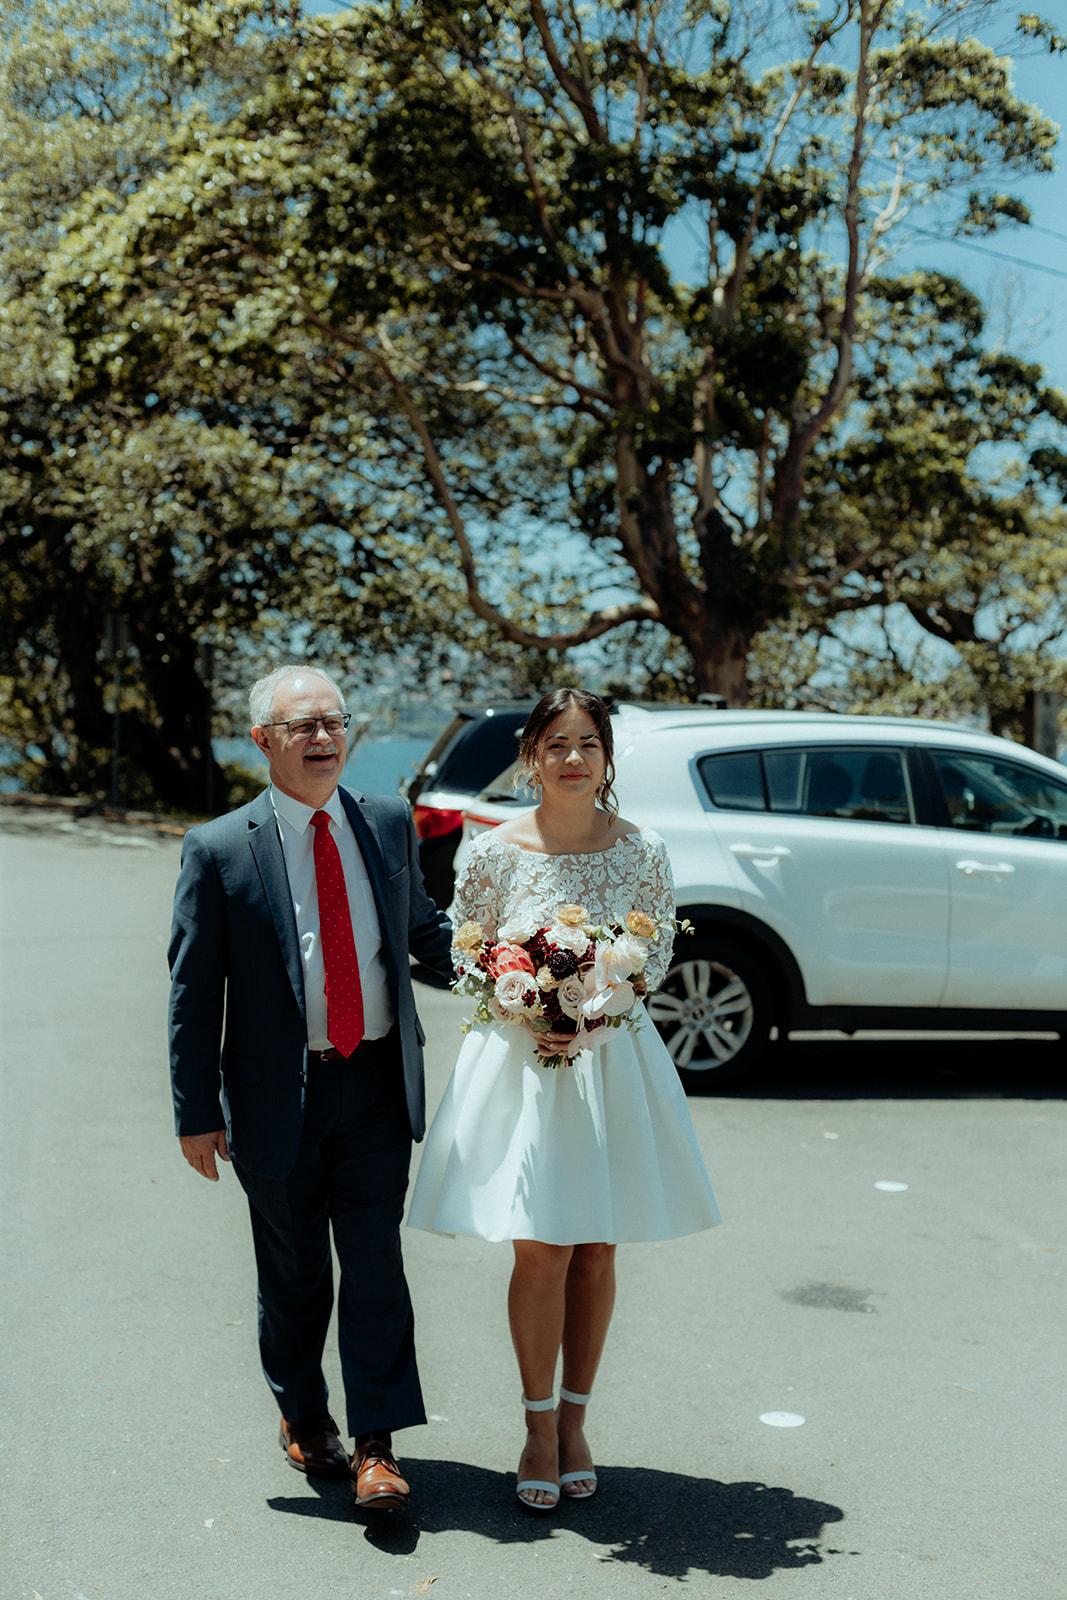 Karis and Oli_Sydney Wedding_Bradleys Head_Holly Medway Photography-186.jpg